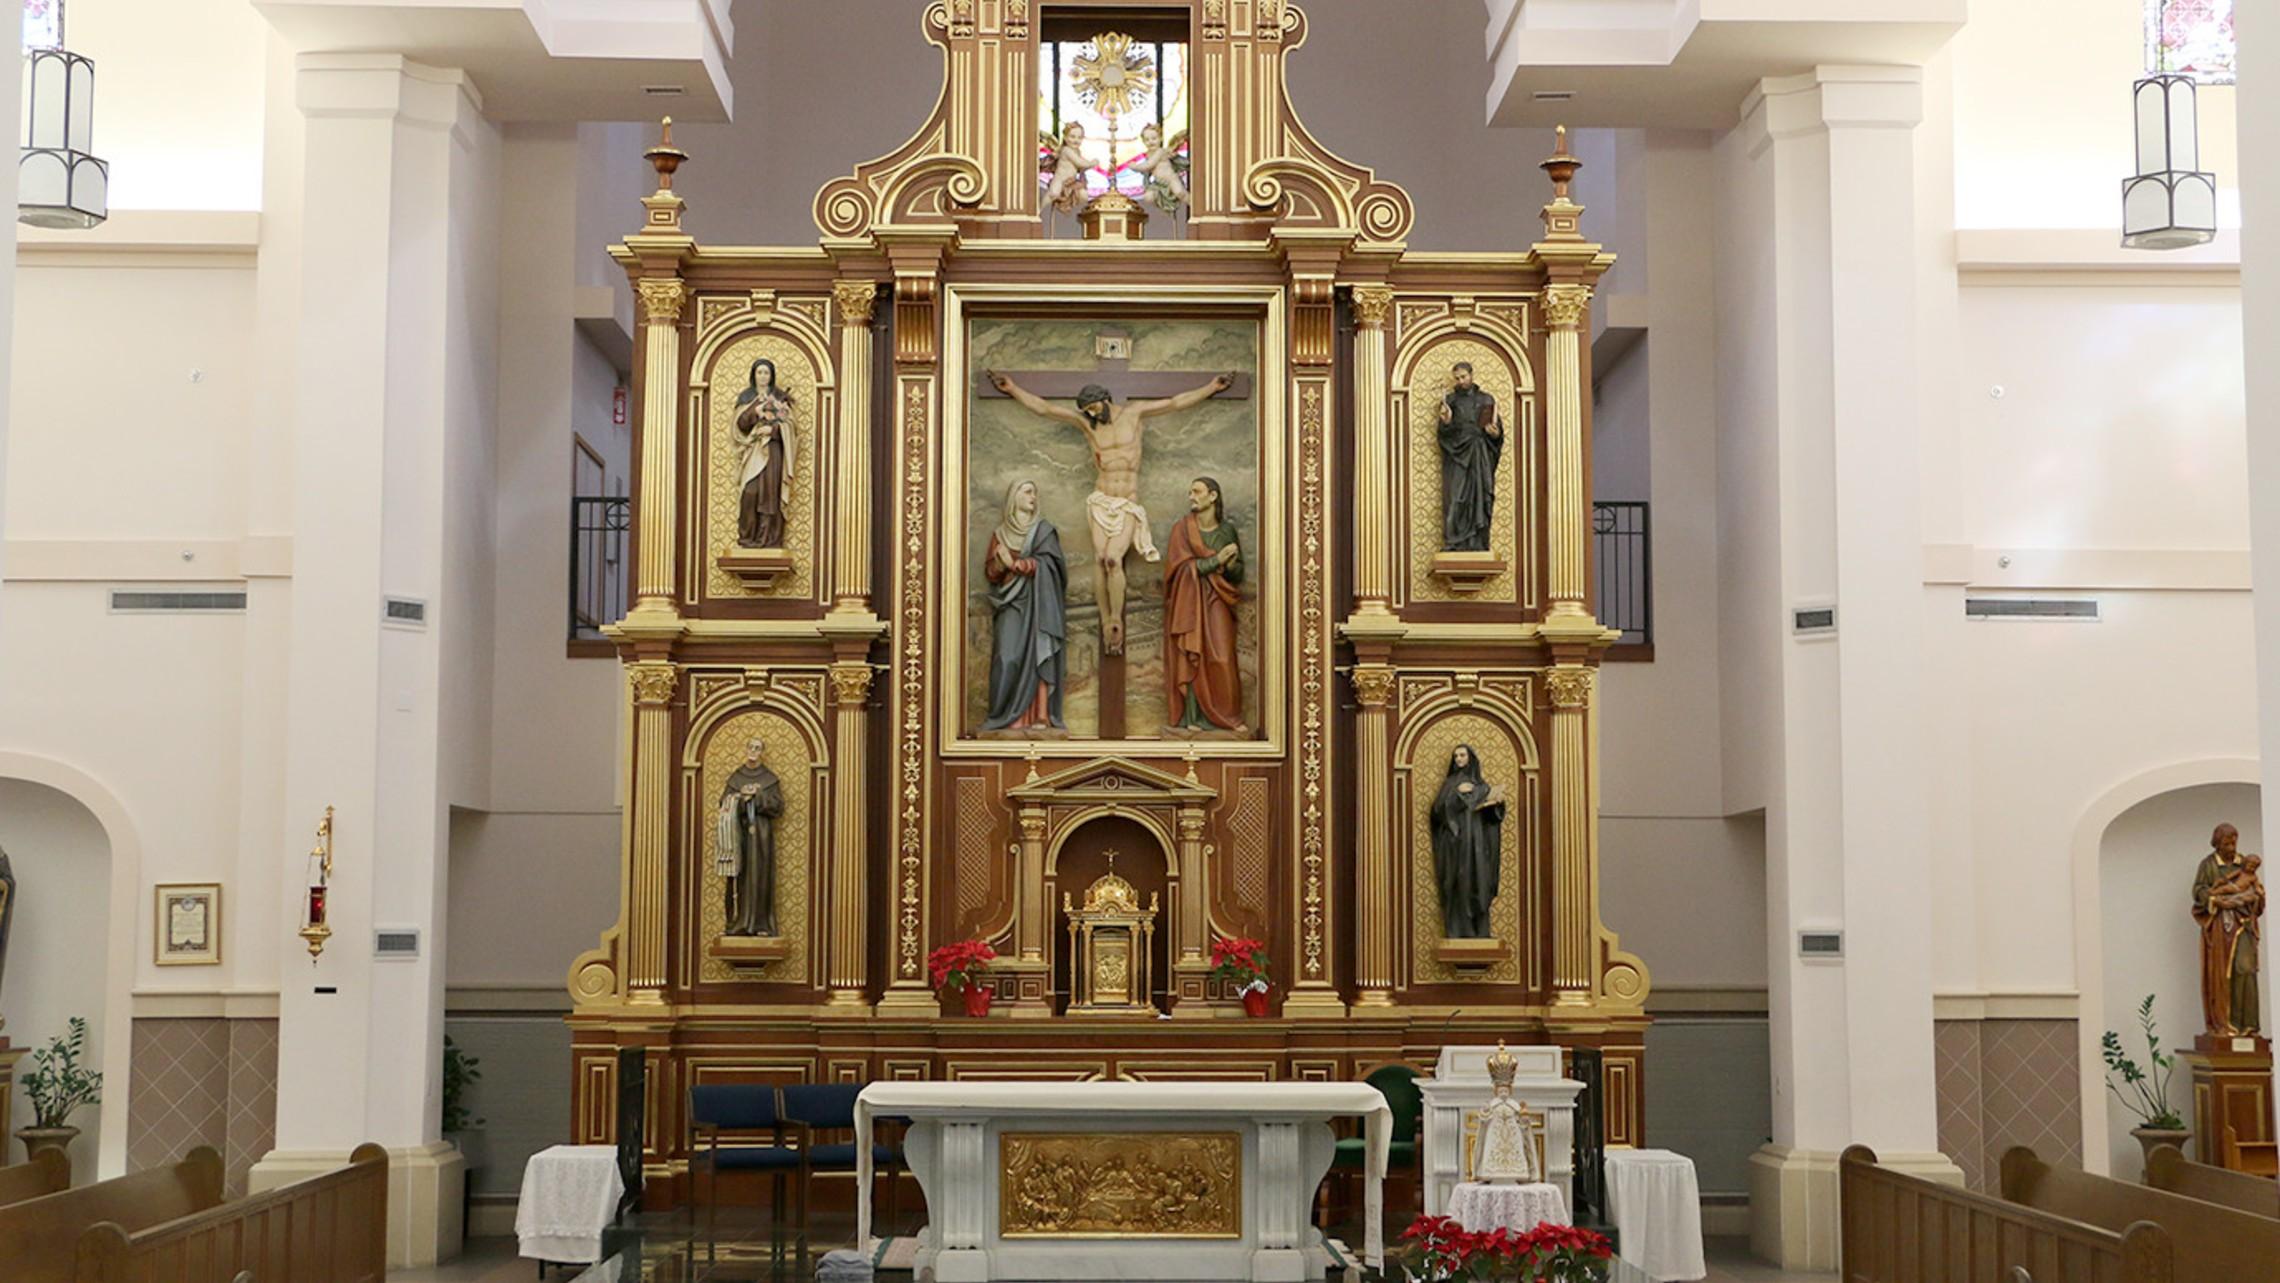 Olcc Chapel